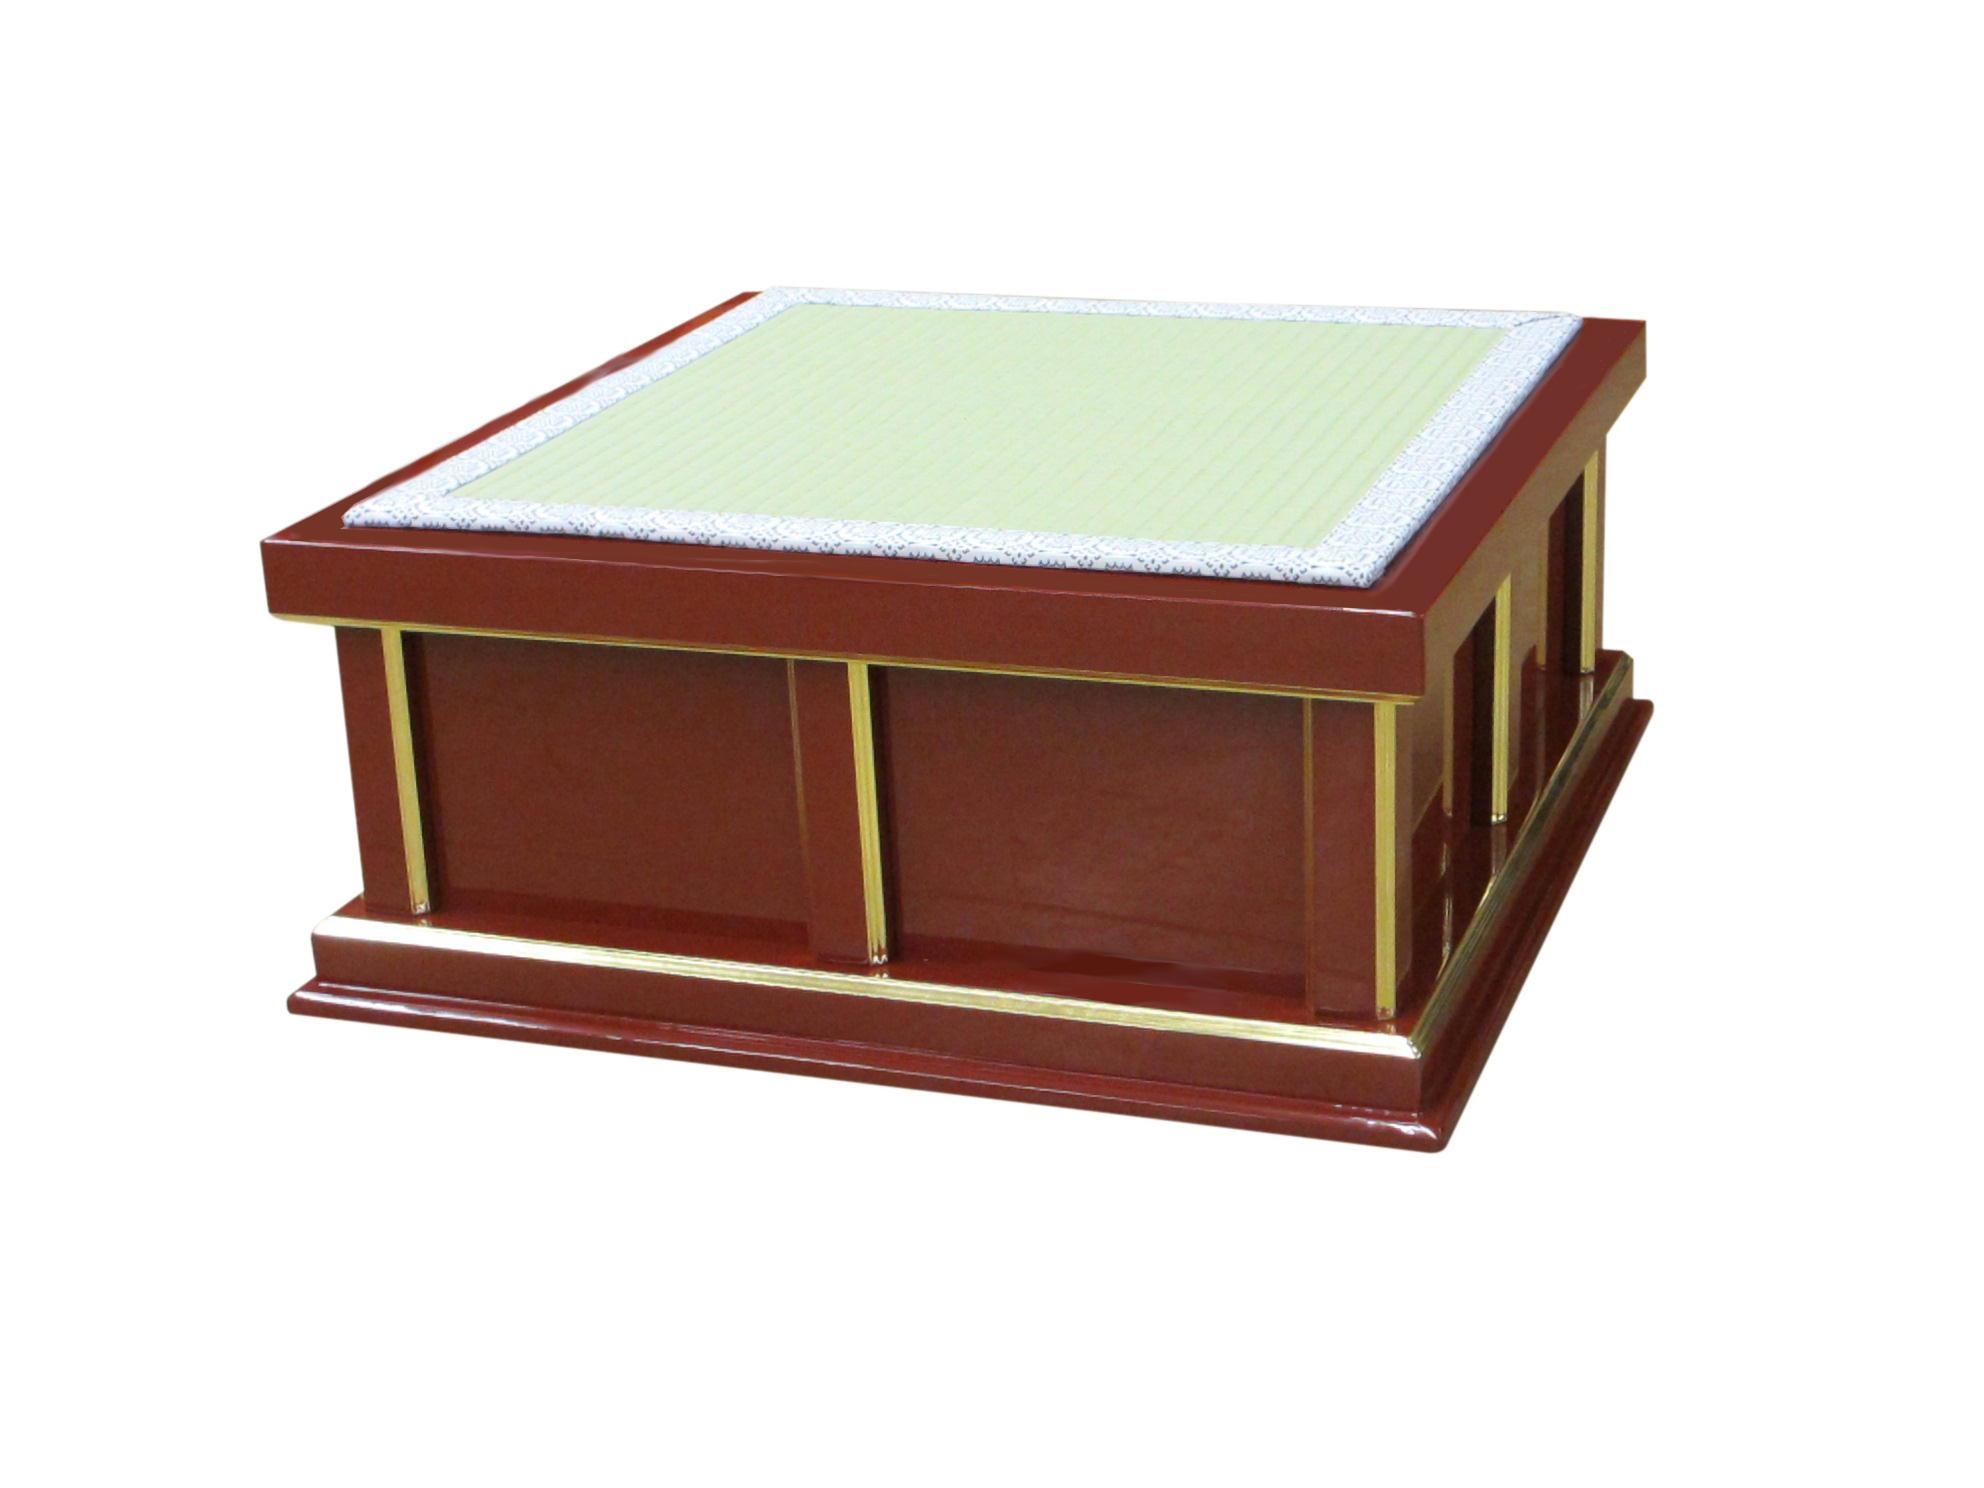 【寺院仏具】幅60センチ 朱塗りの新型礼盤 (受注生産品)(商品番号11007s)